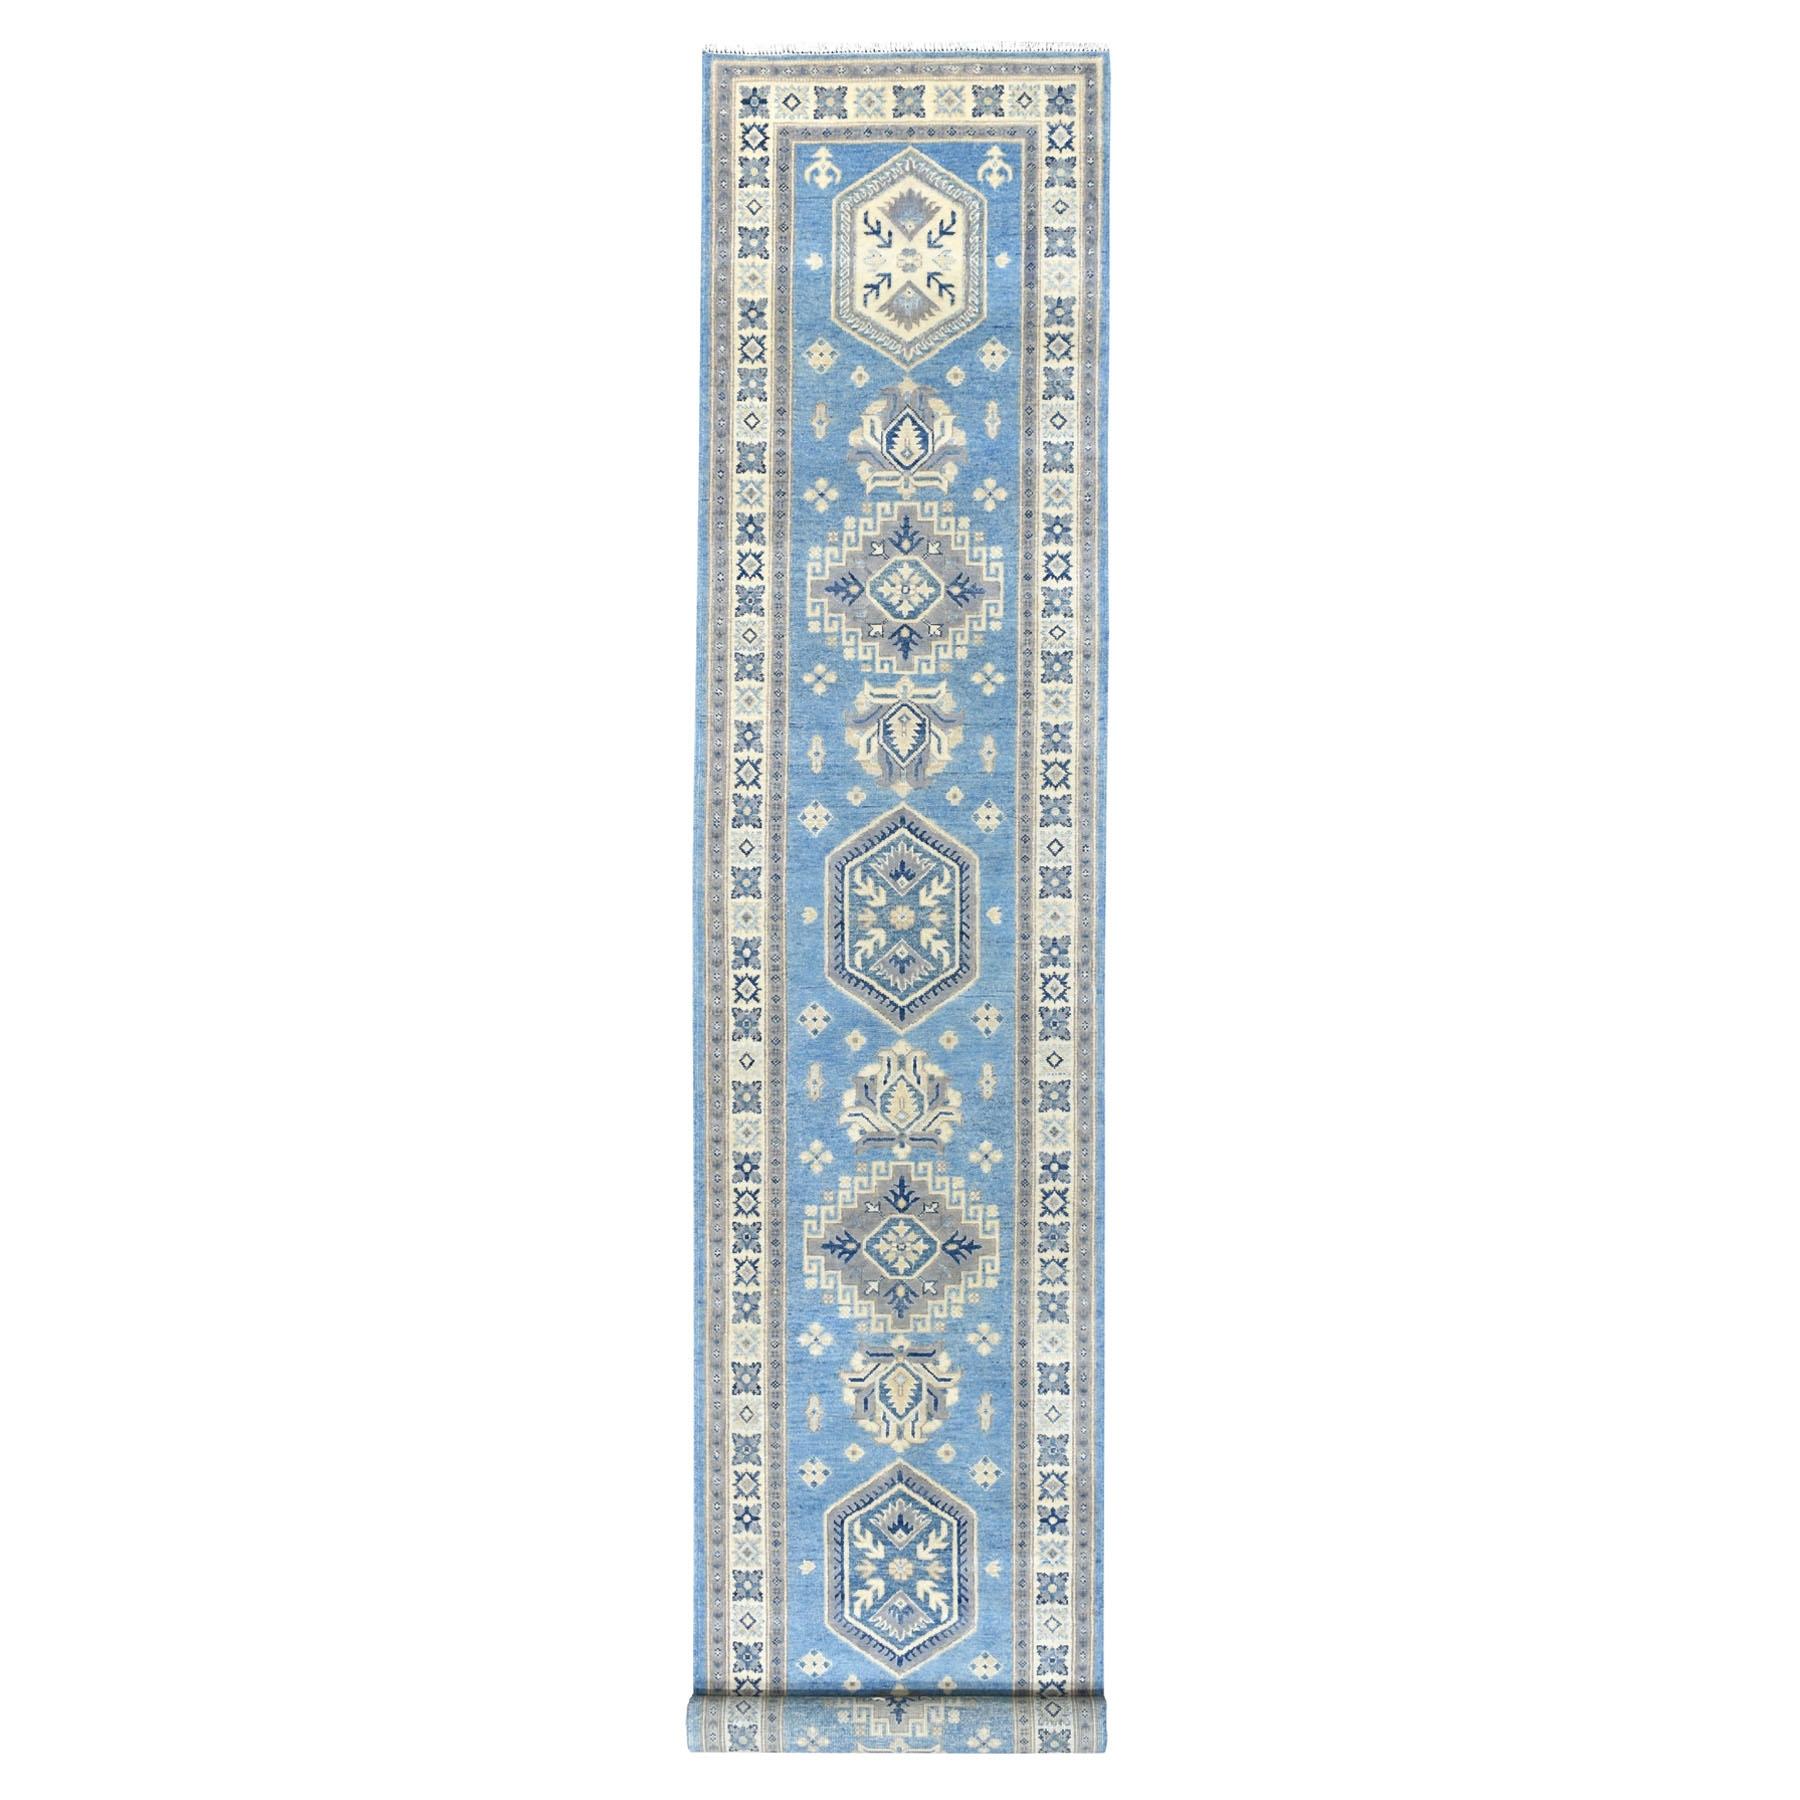 "2'9""X16' Blue Hand Knotted Vintage Look Kazak Geometric Design Pure Wool Xl Runner Oriental Rug moaed60b"